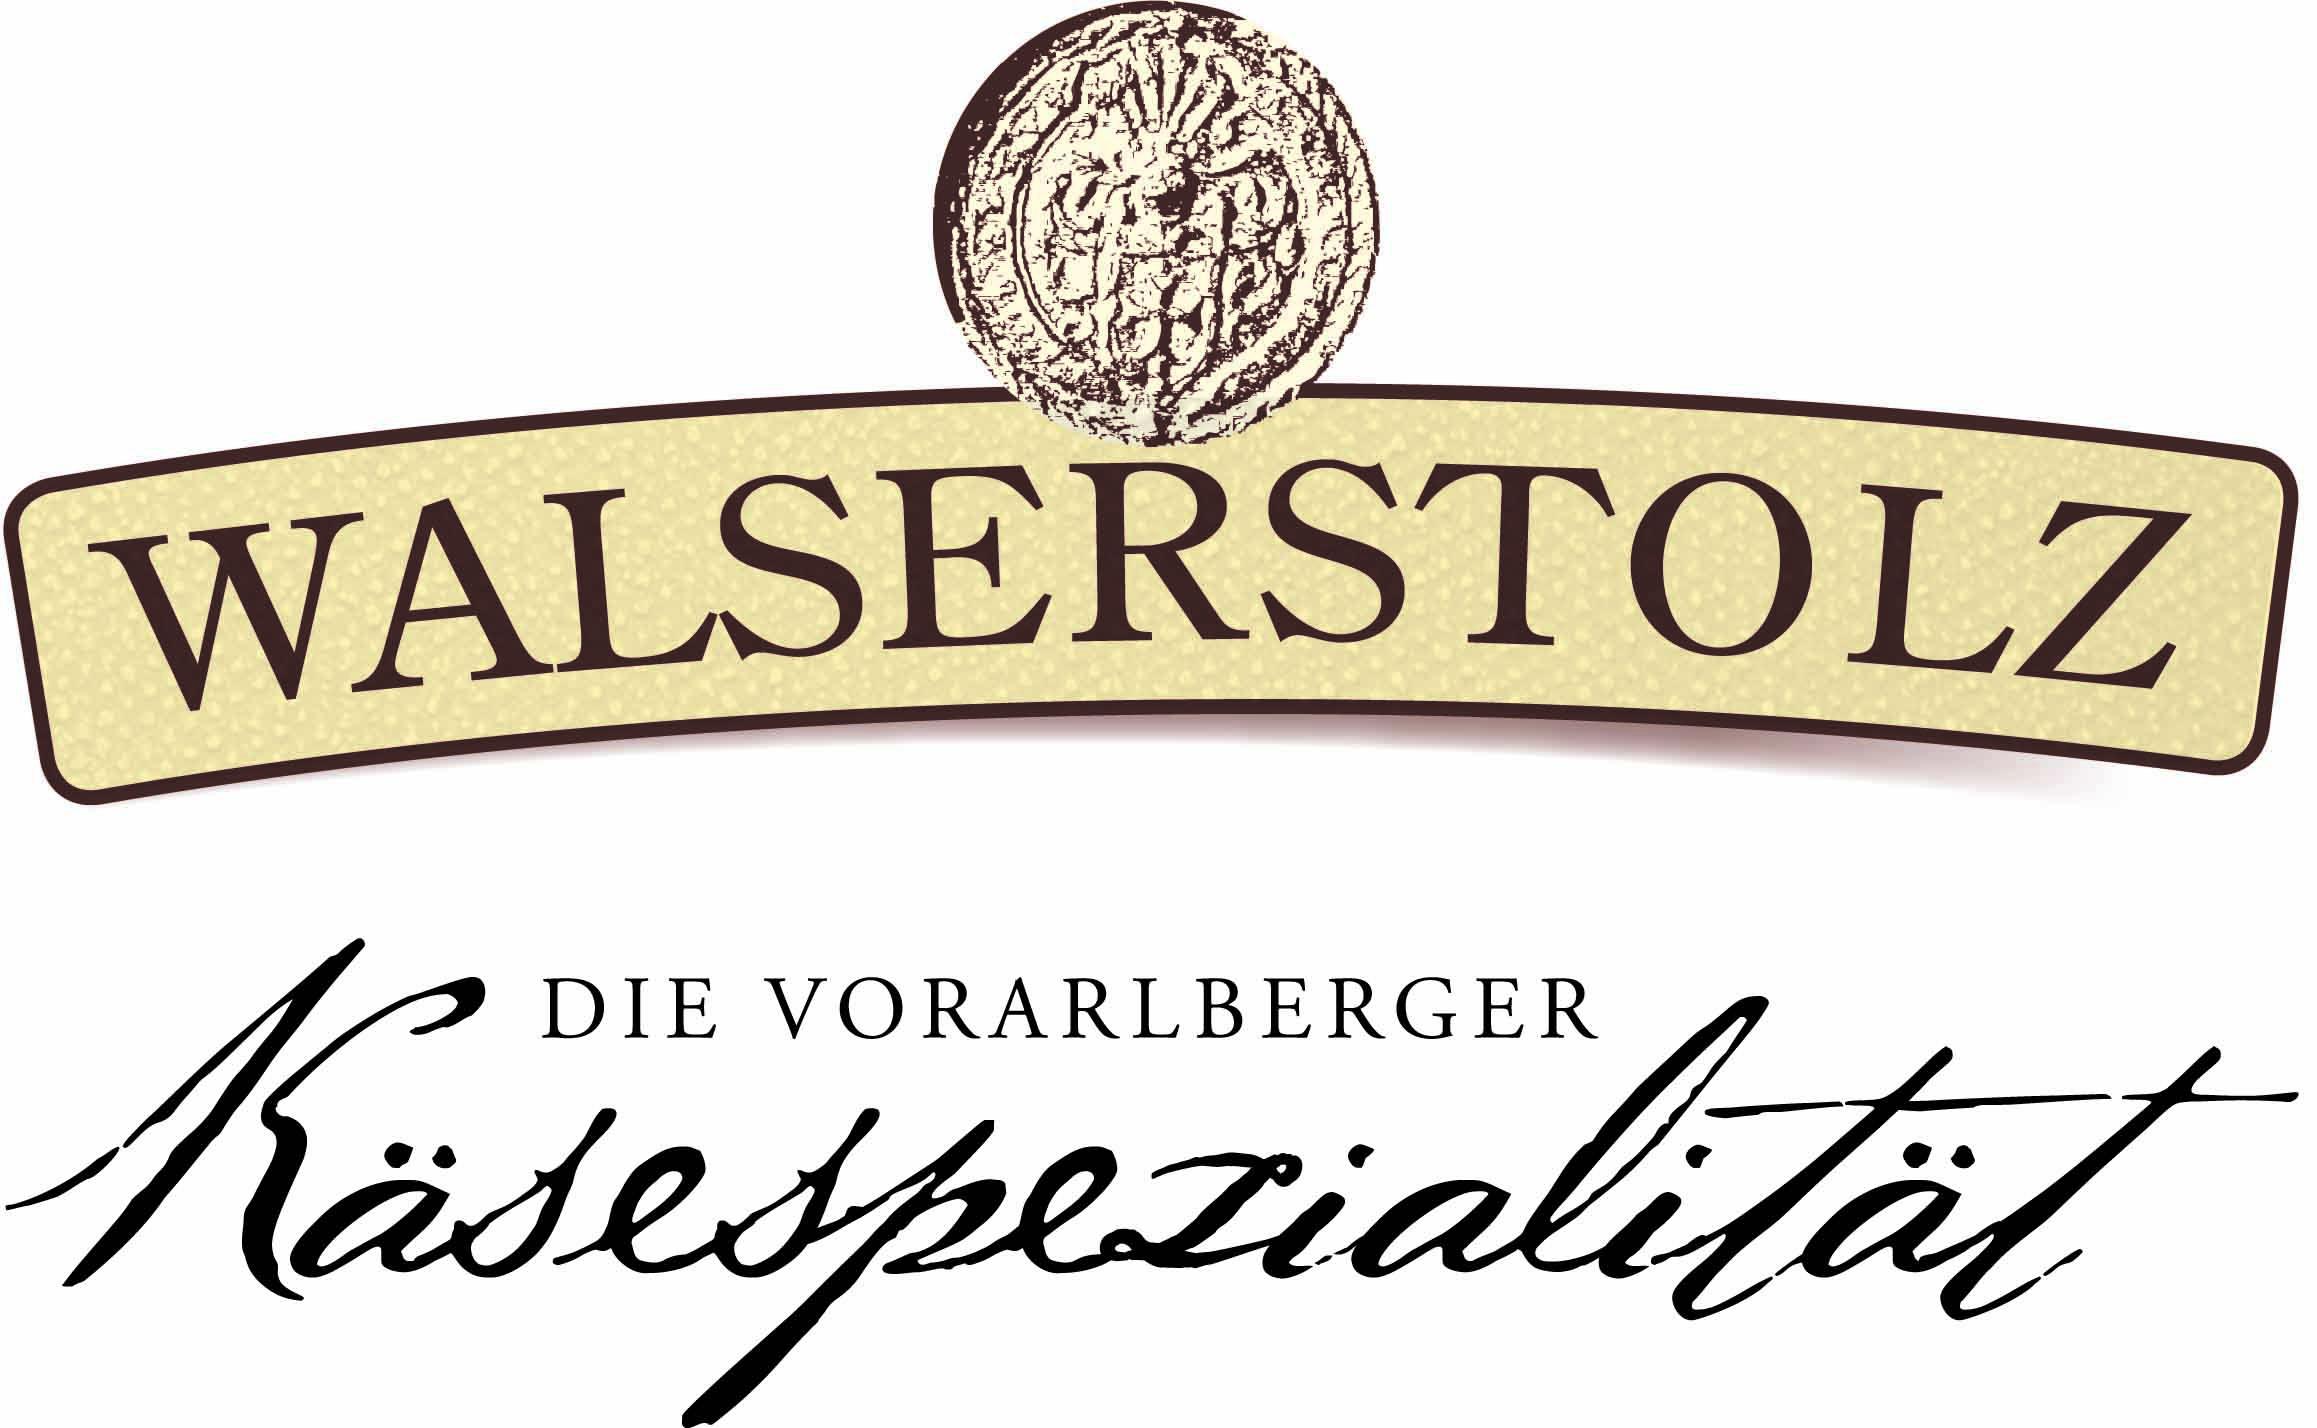 Walserstolz